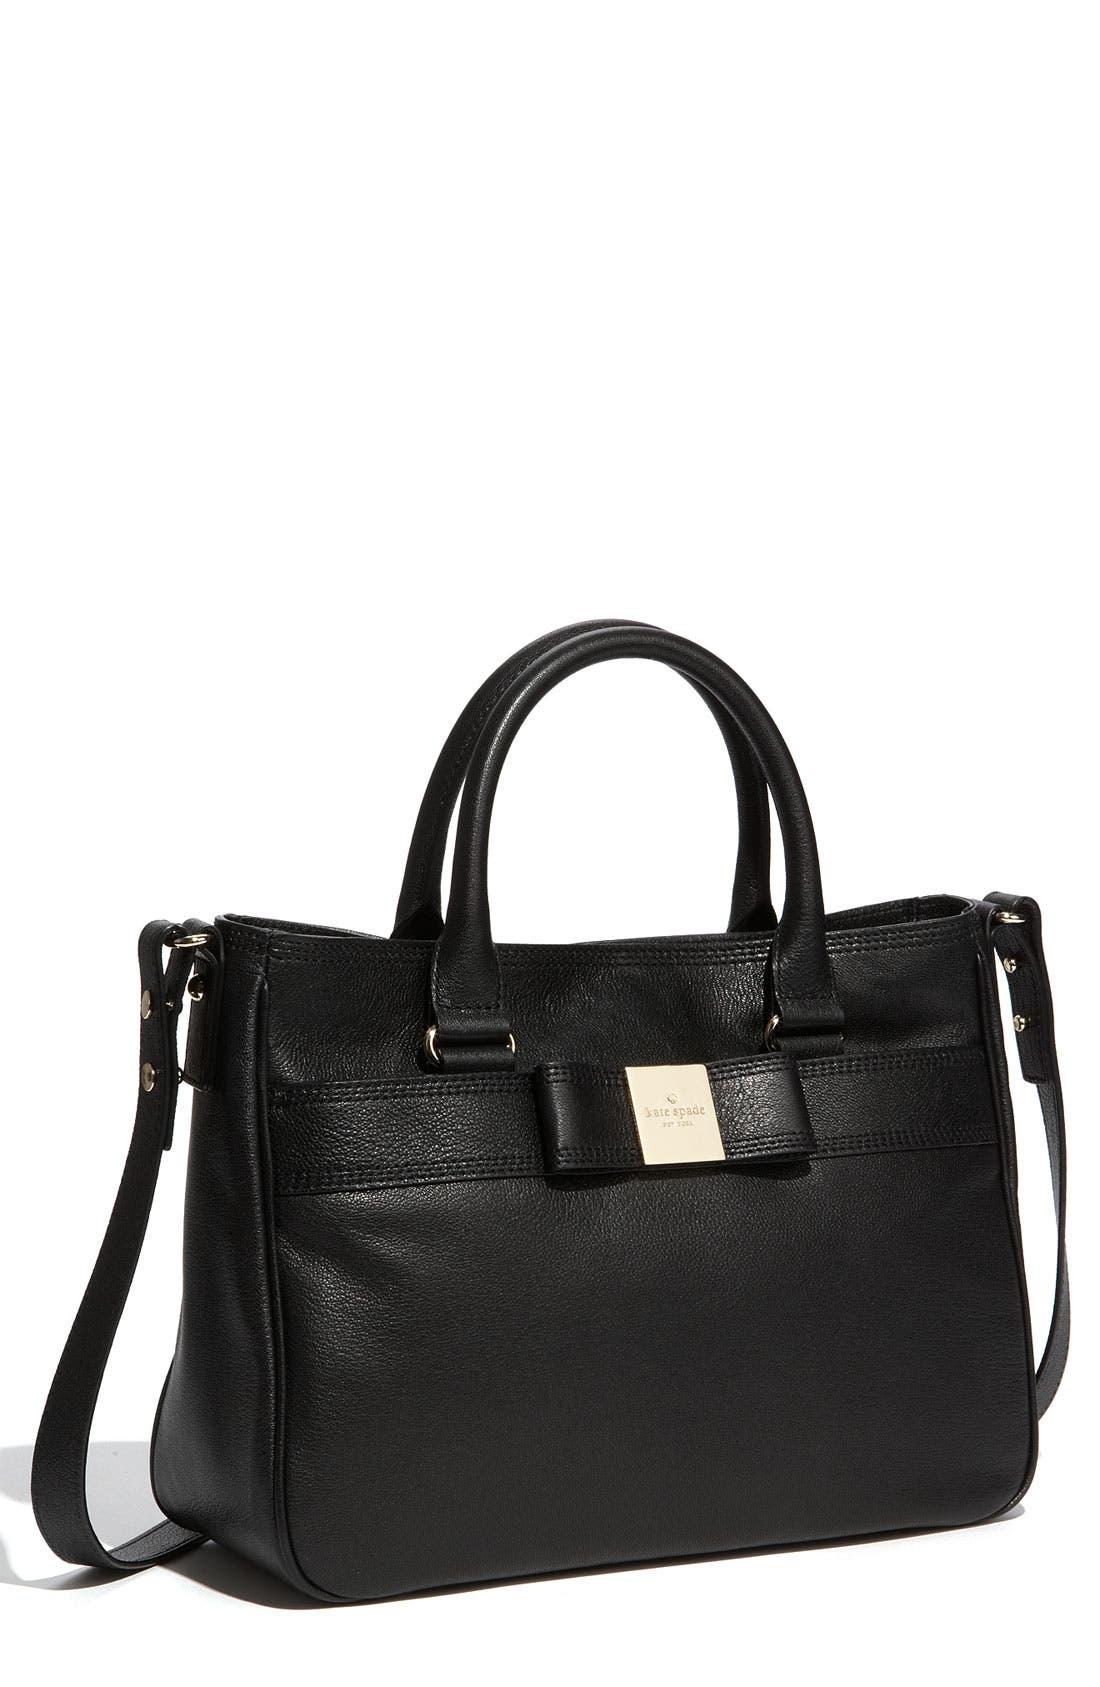 Main Image - kate spade new york 'primrose hill - goldie' leather satchel